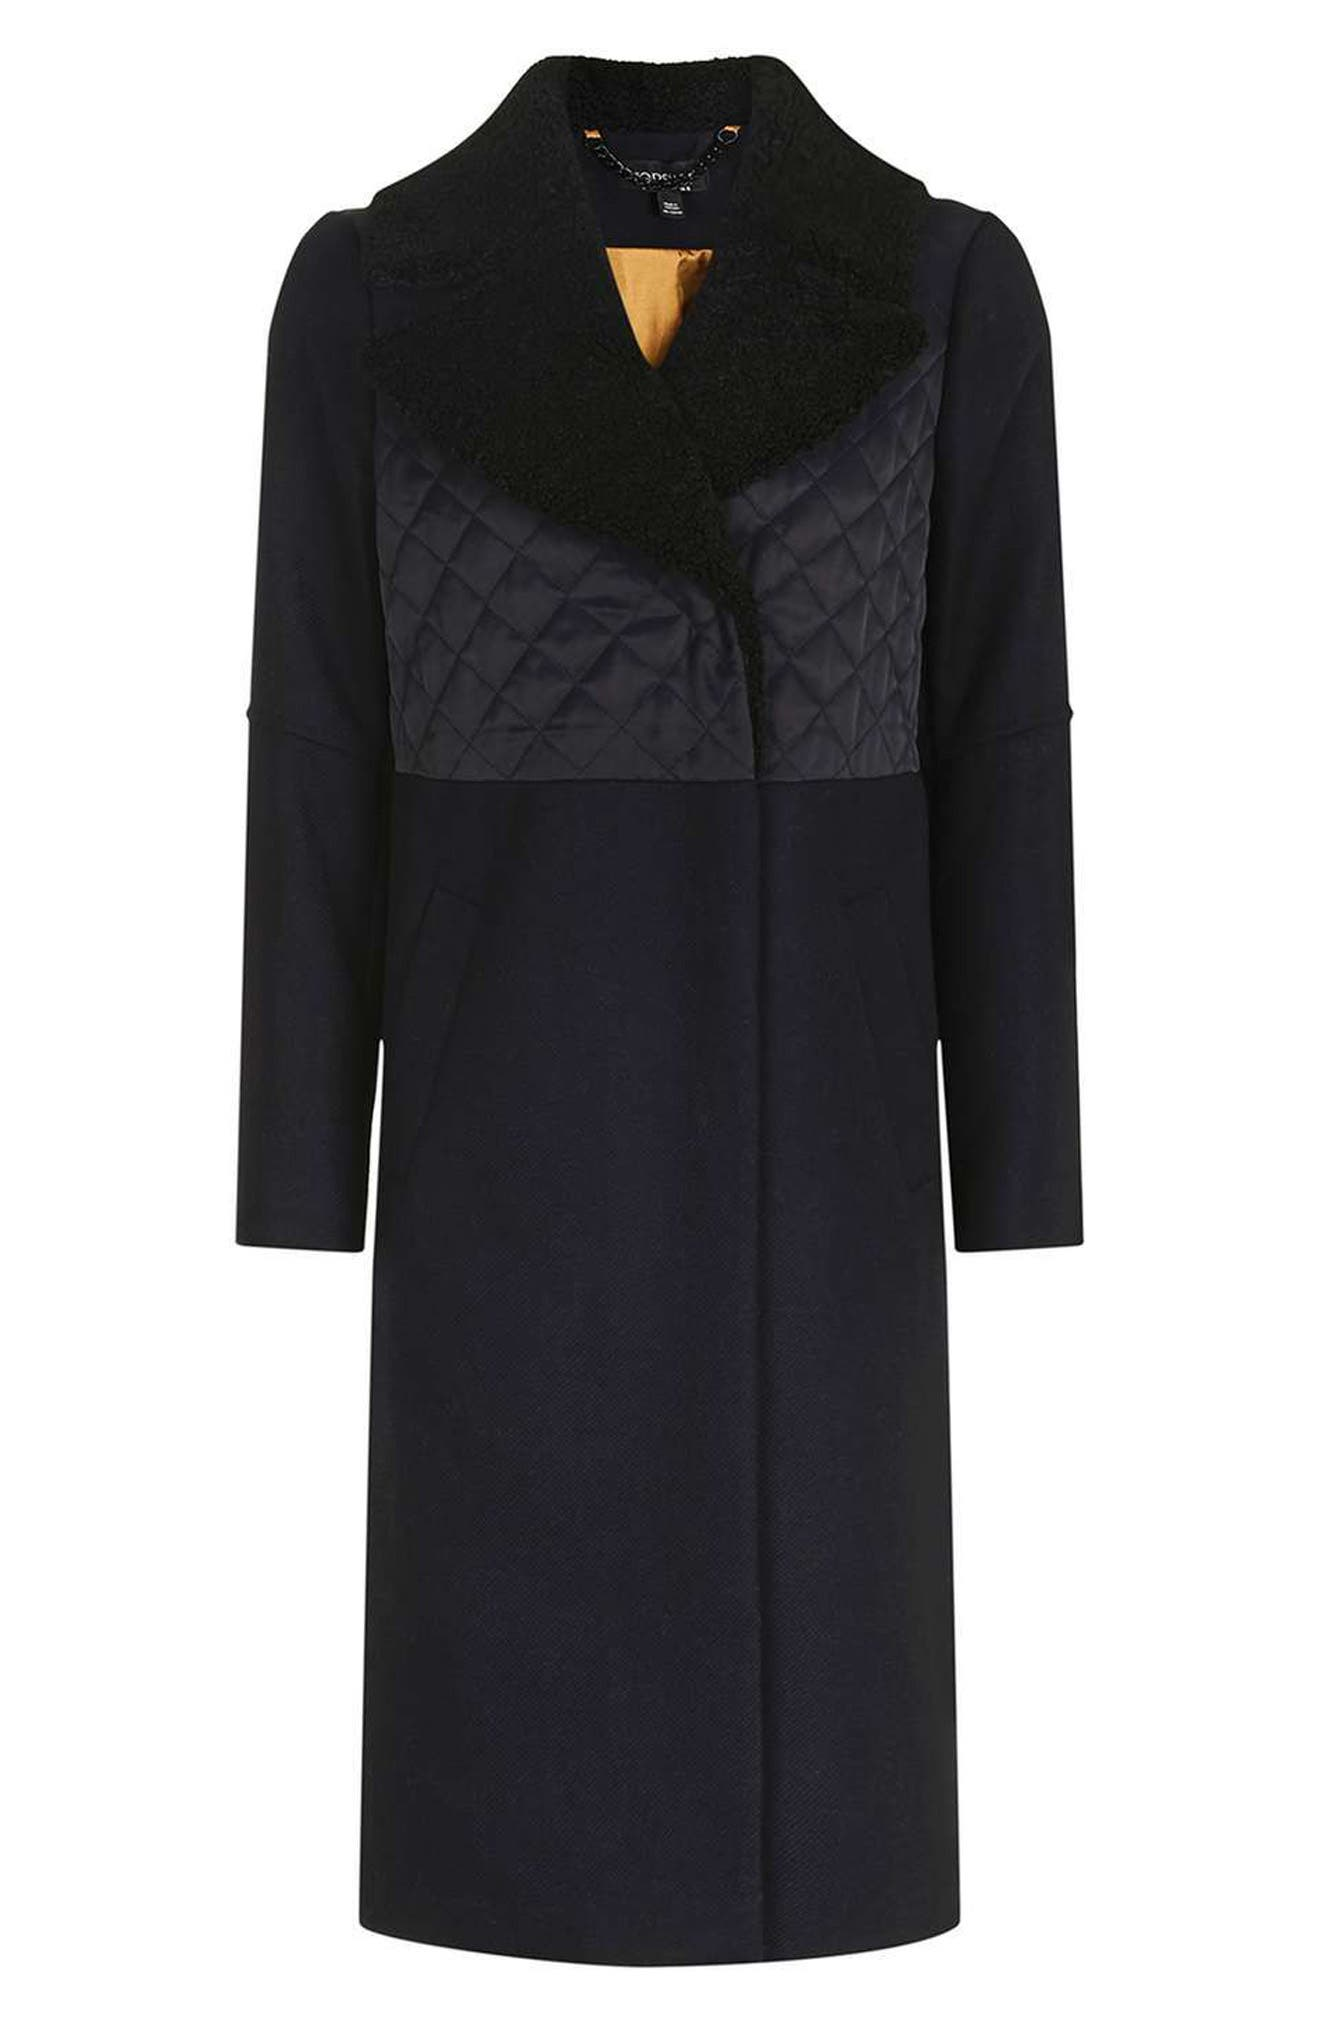 TOPSHOP, Faux Shearling Collar Coat, Alternate thumbnail 4, color, 410